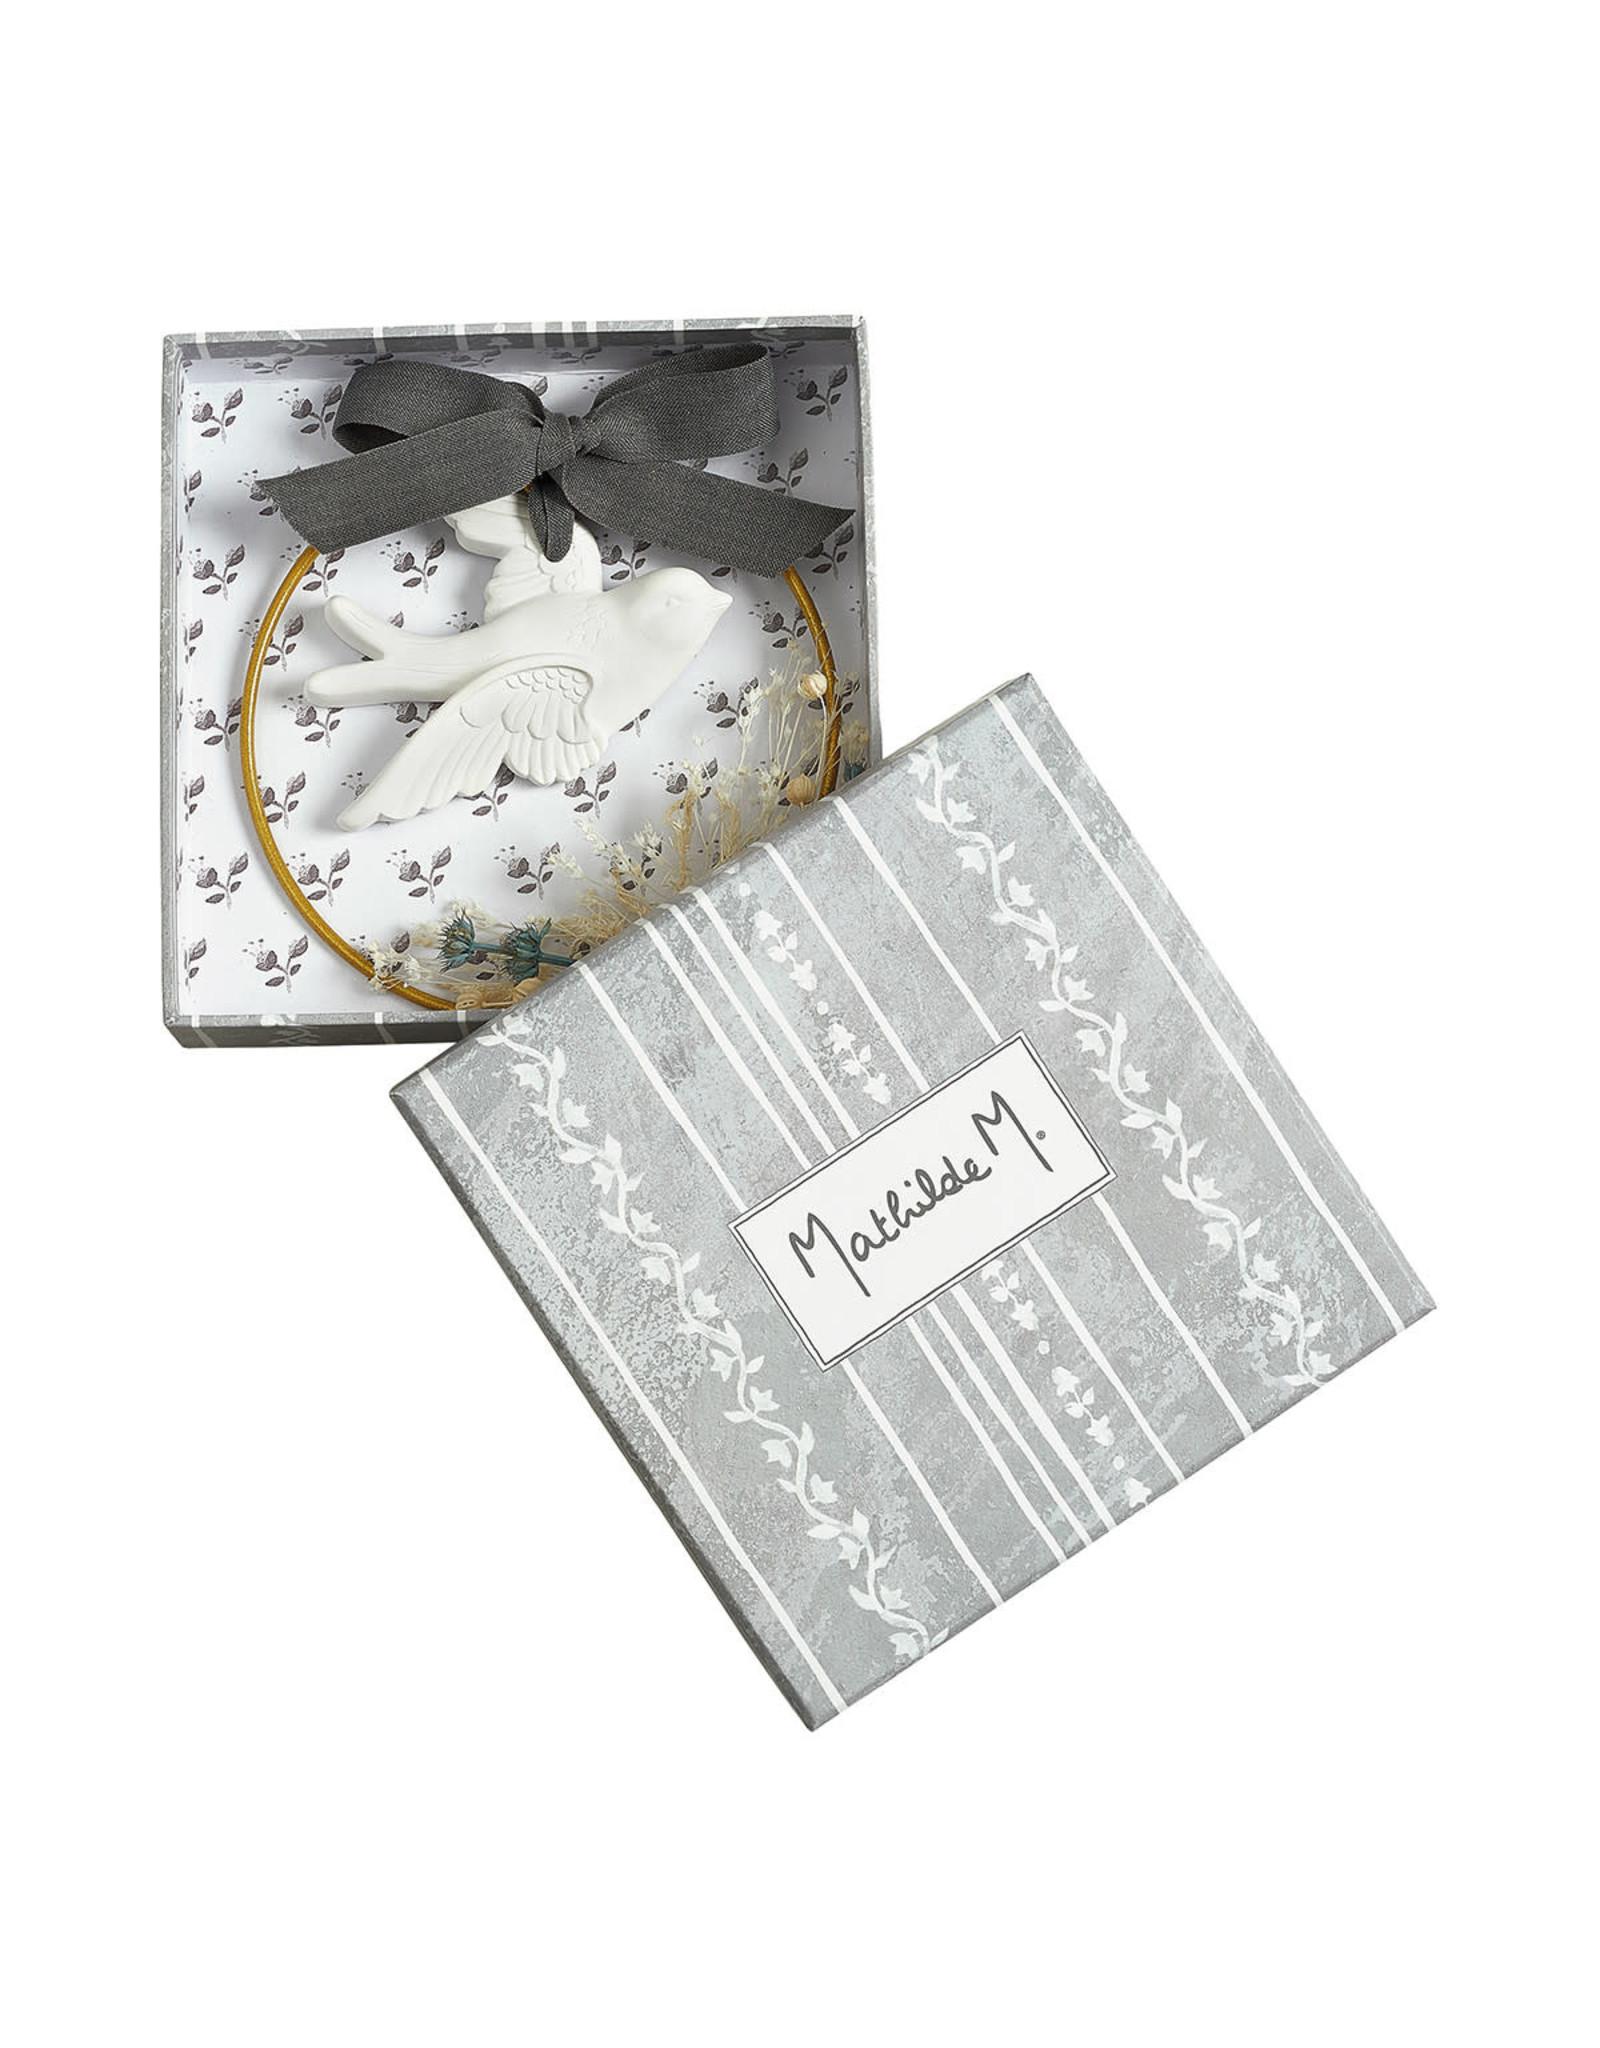 Mathilde M Fleur de Coton - Geurdecoratie Droogbloemen